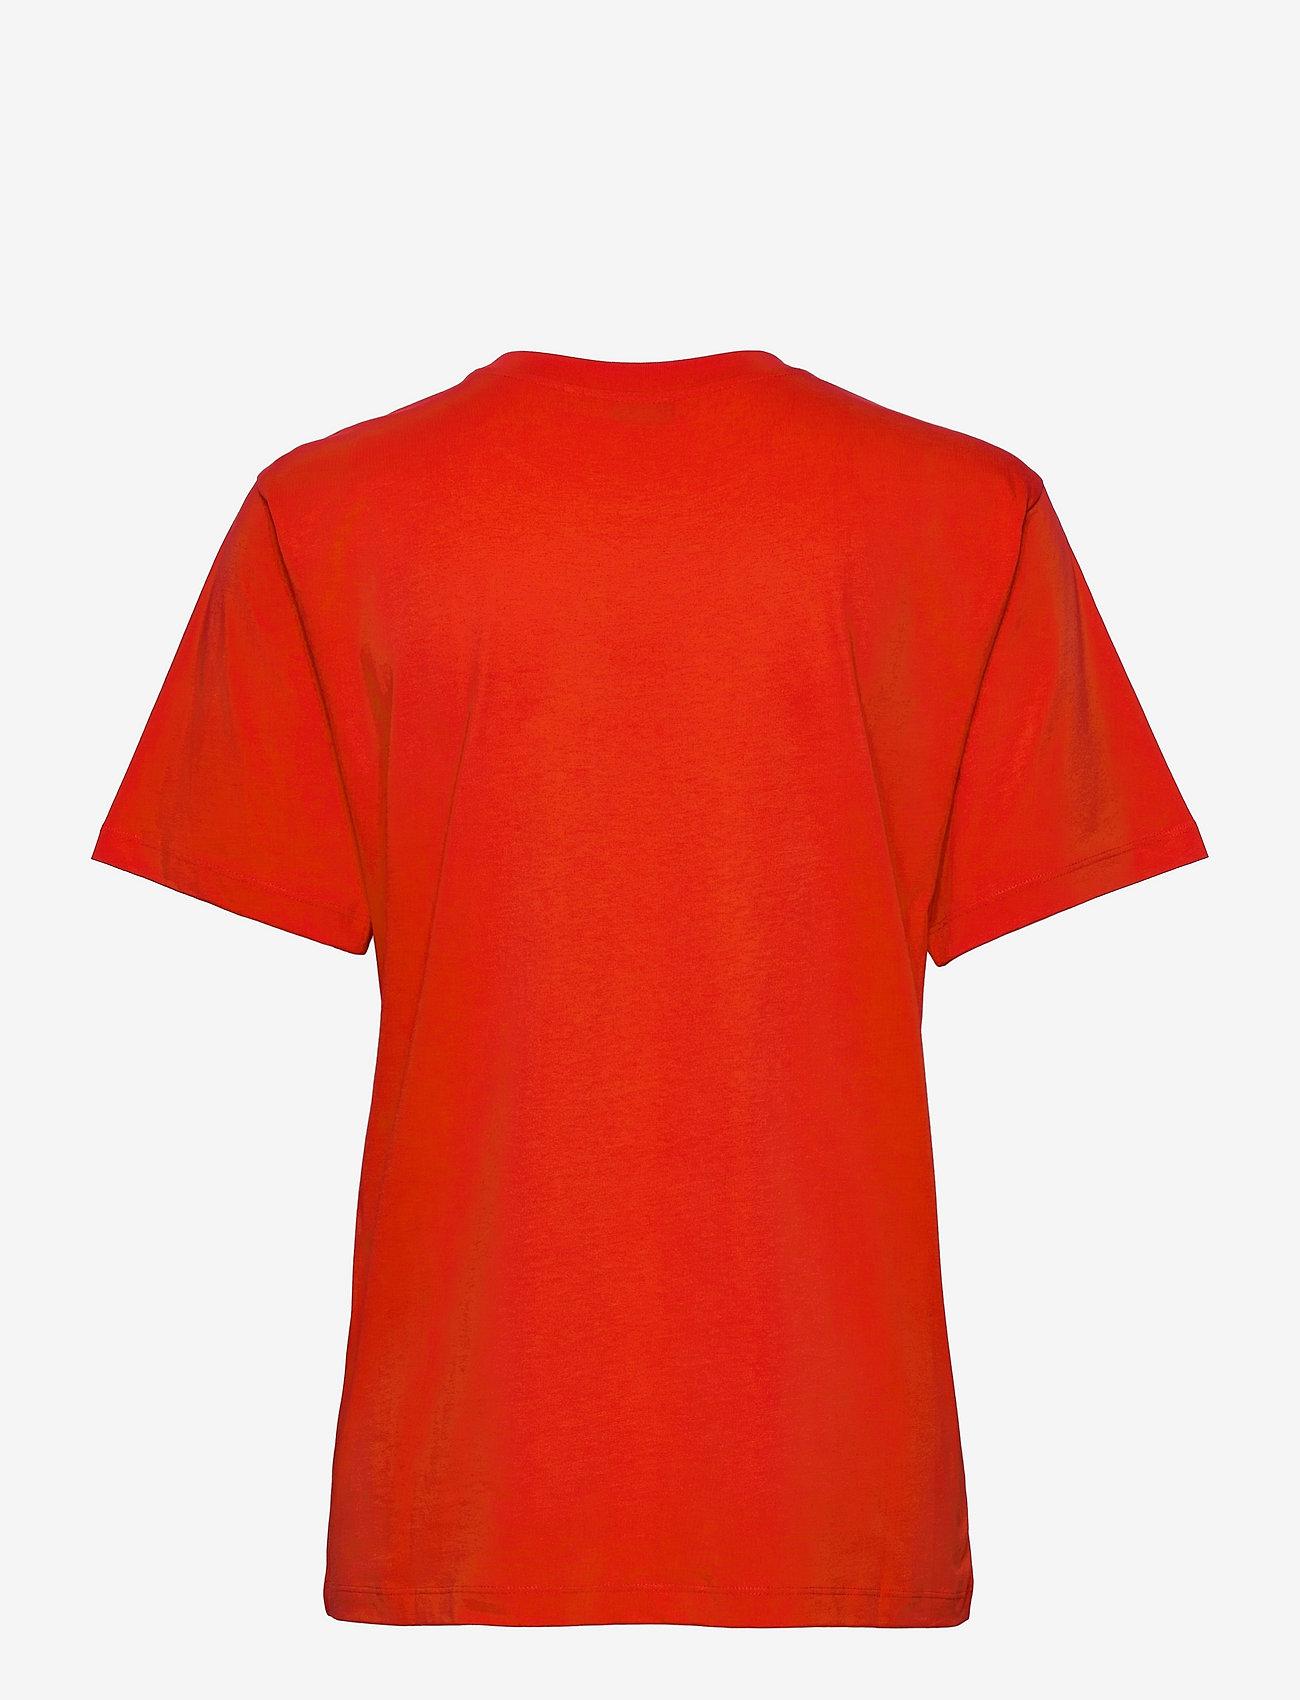 Marimekko - HIEKKA UNIKKO PLACEMENT T-SHIRT - t-shirts - red, off white - 1